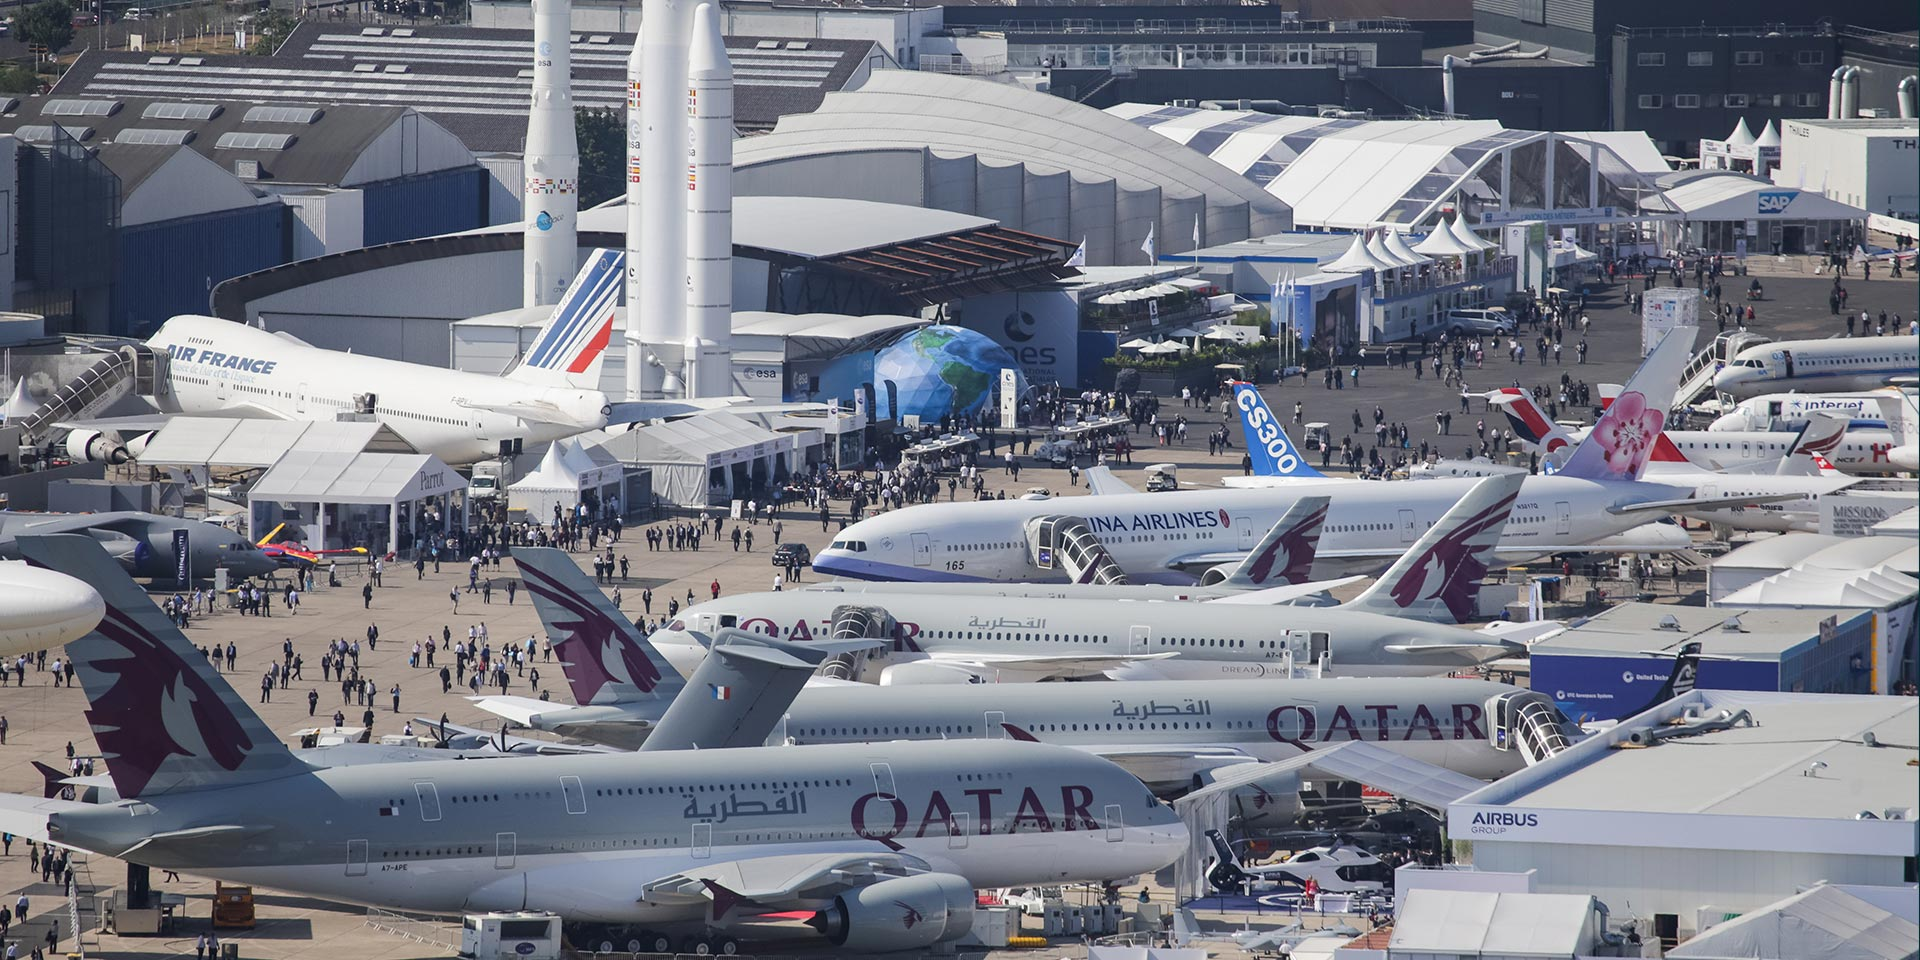 Rencontre aeronautique gimont 2017